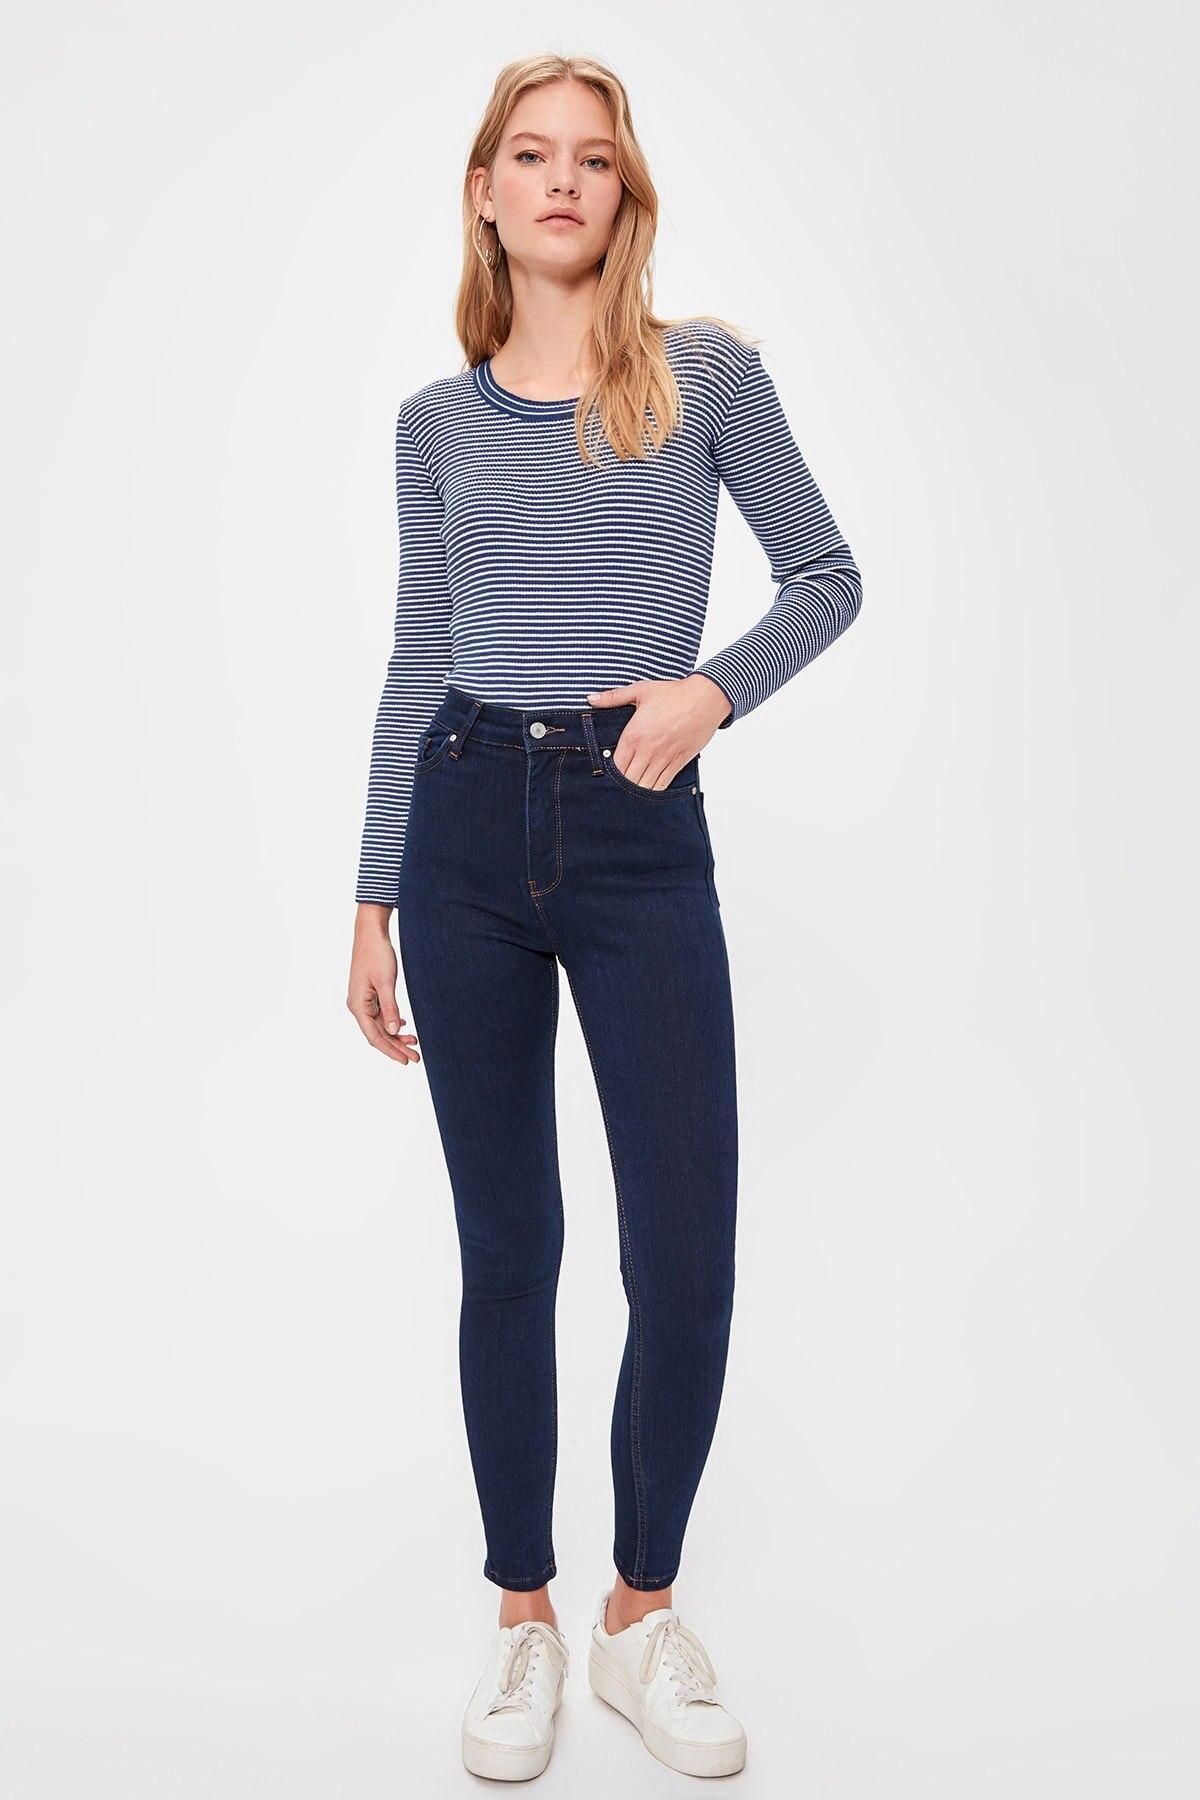 Trendyol High Waist Skinny Jeans TWOAW20JE0315